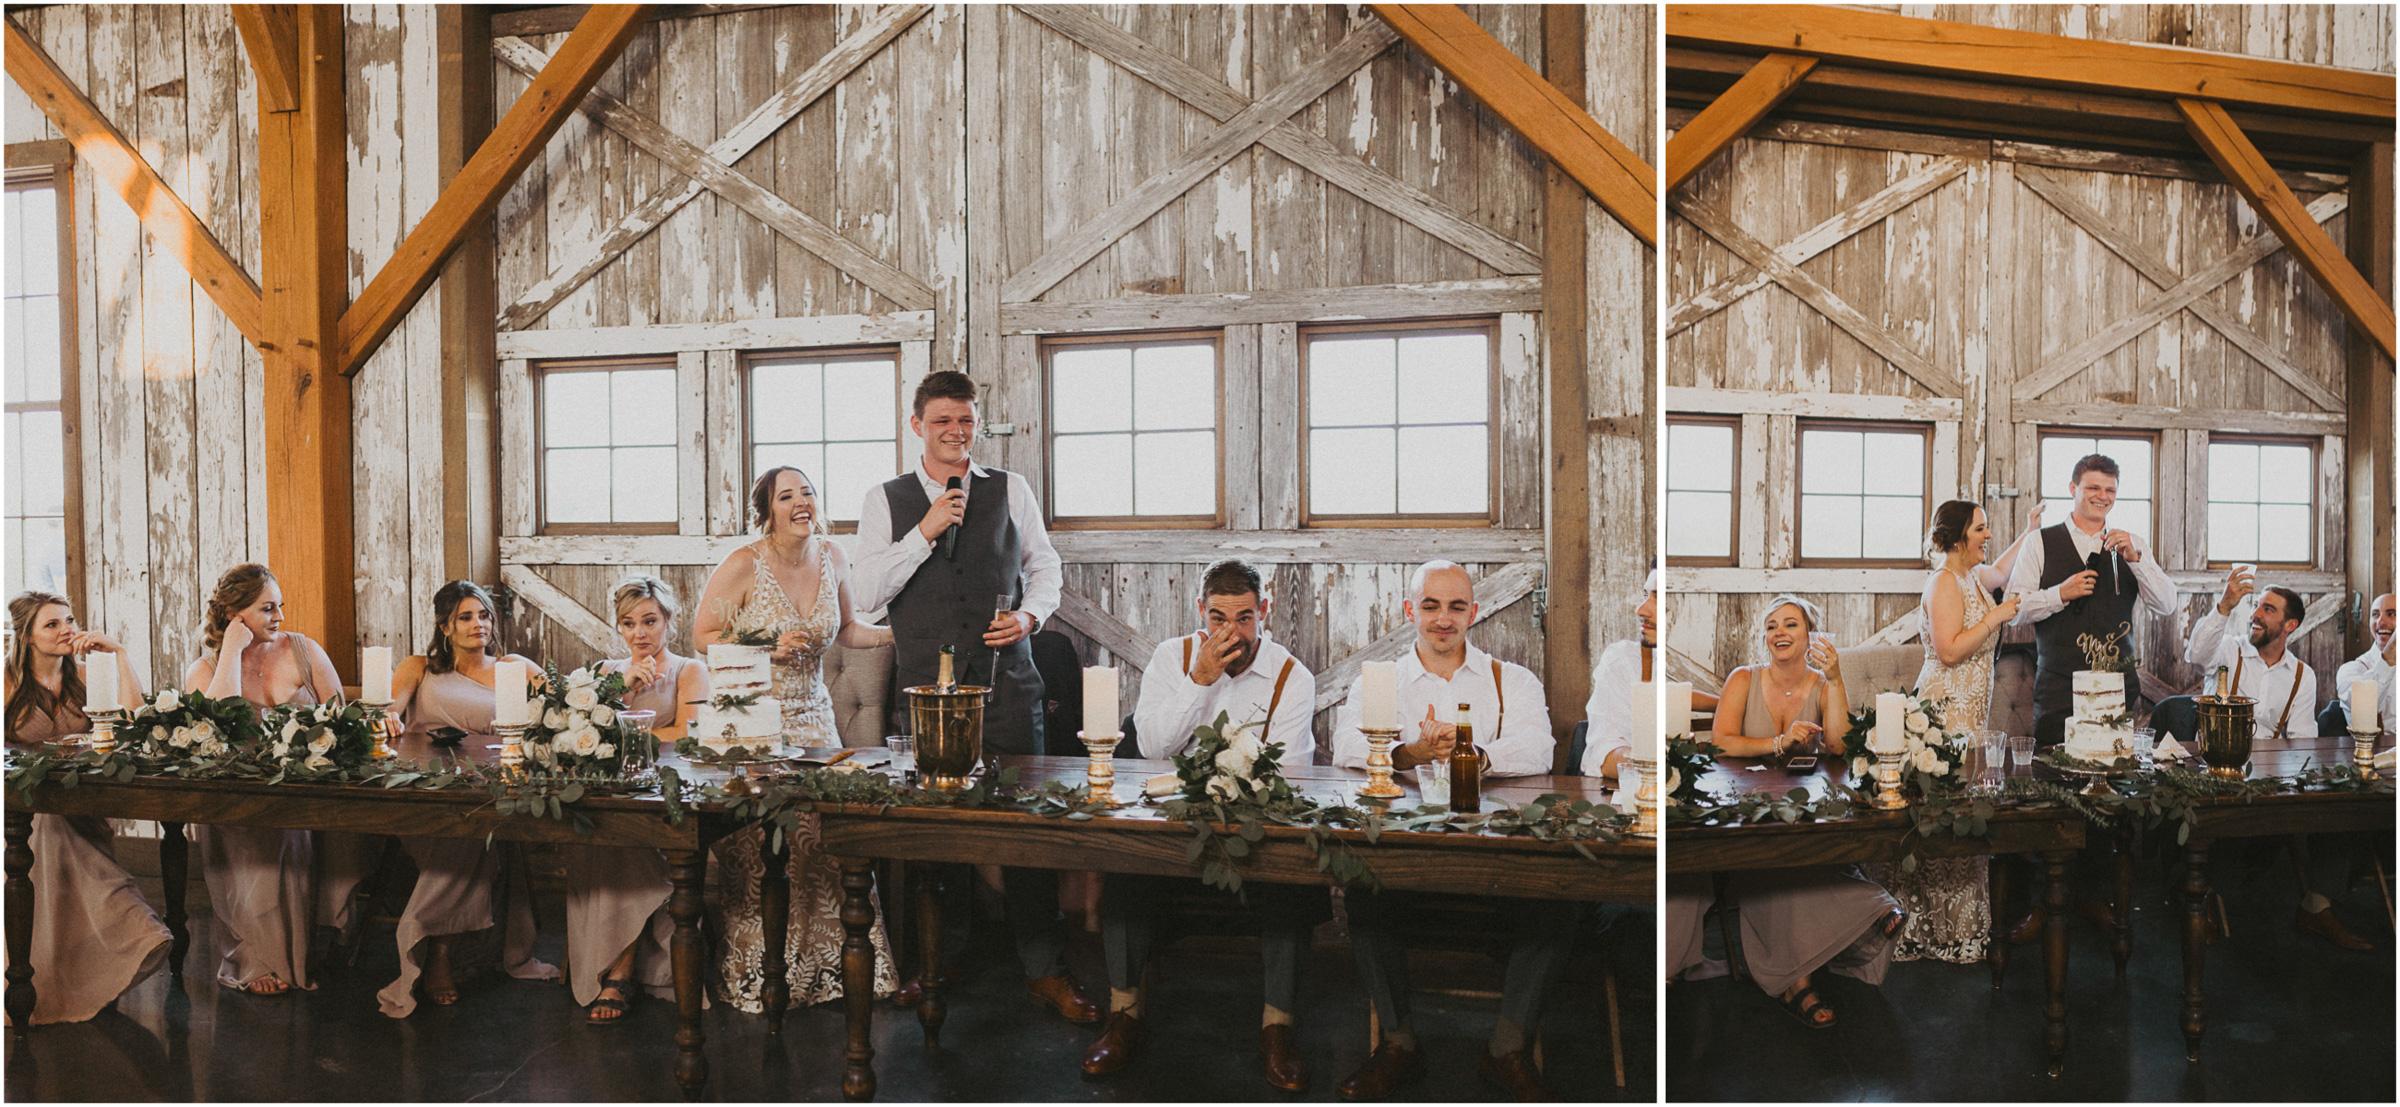 alyssa barletter photography weston red barn farm timberbarn summer outdoor wedding-60.jpg